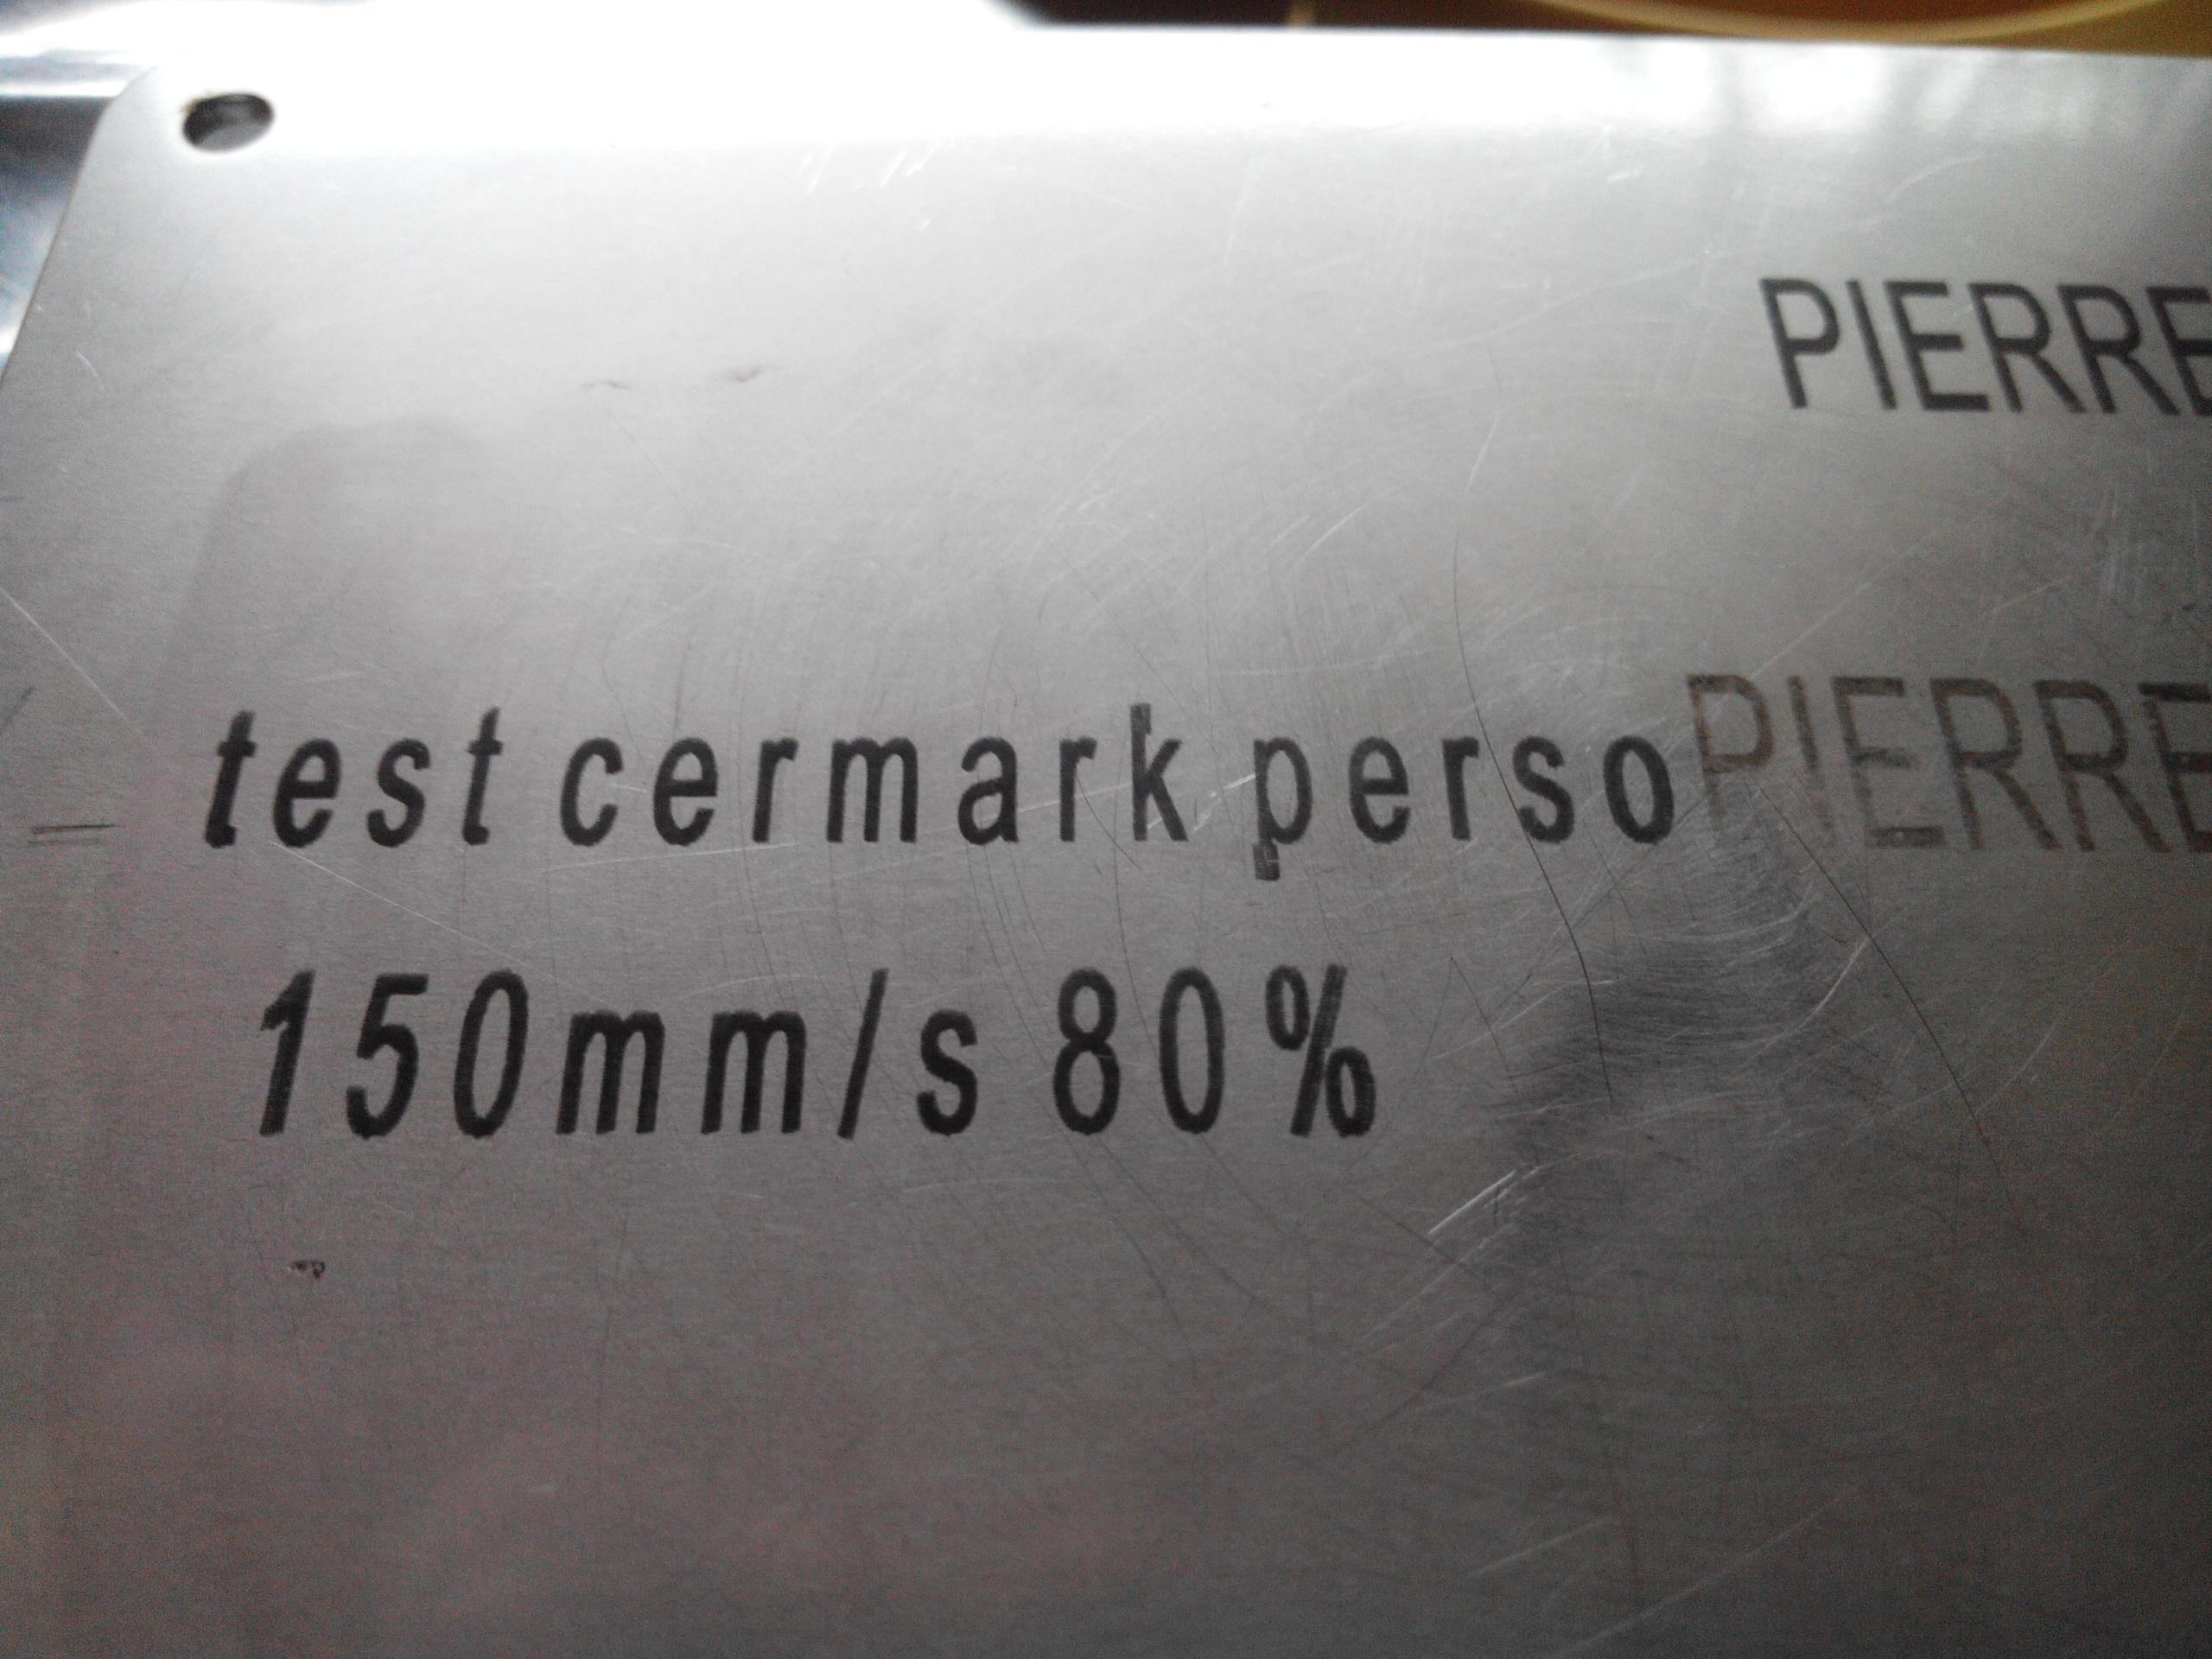 www.decoupecnc.be/laser/cermark1.jpg